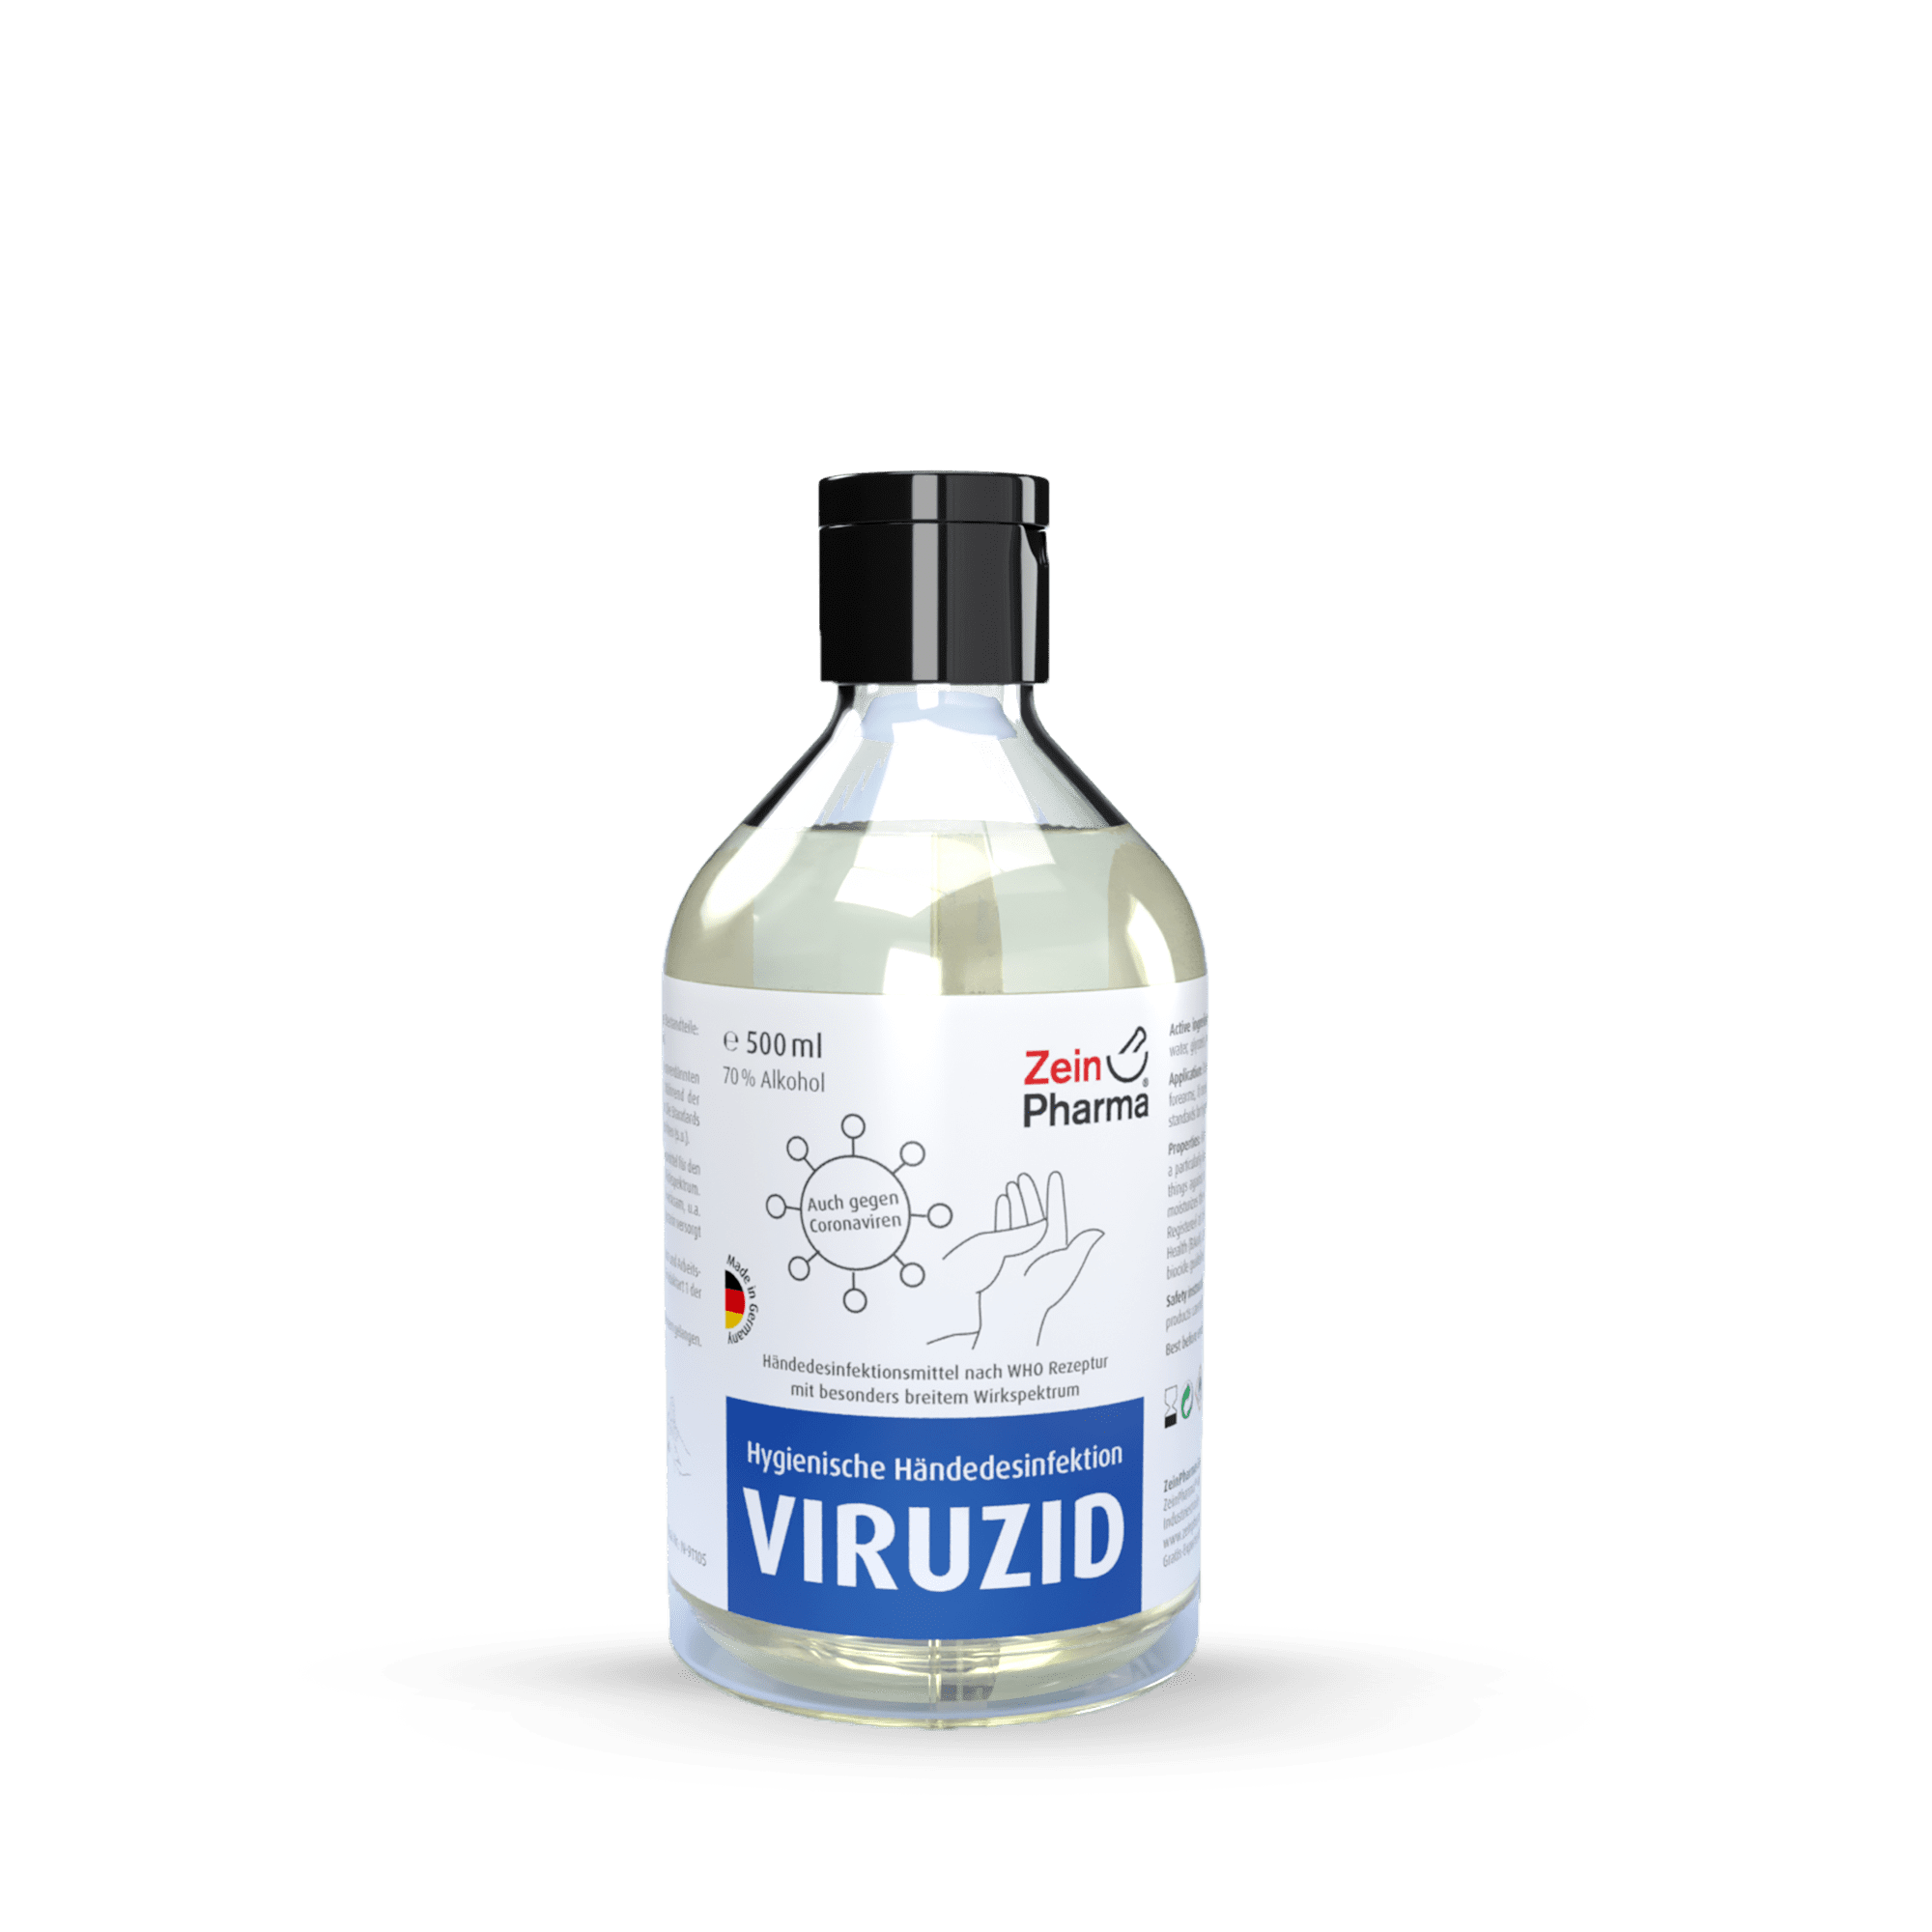 Händedesinfektionsmittel WHO Rezeptur, begrenzt viruzid